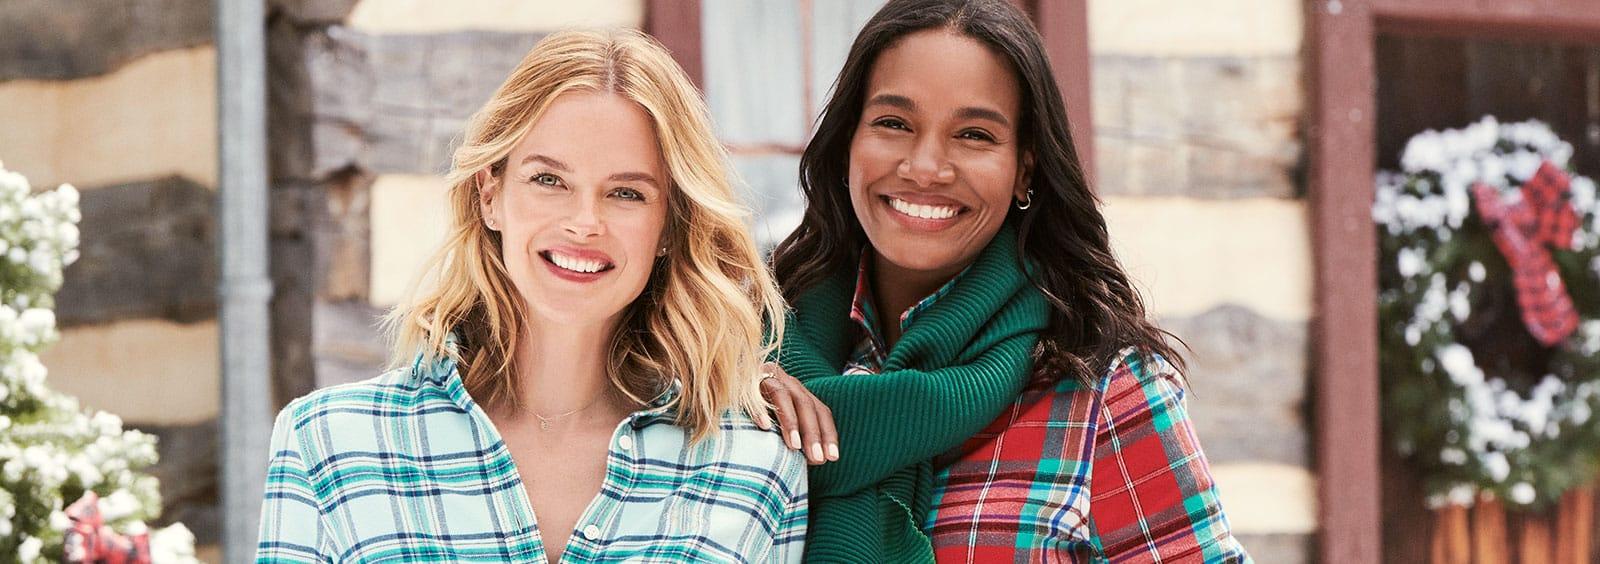 5 Creative Ways to Wear Flannel Shirts Throughout Winter